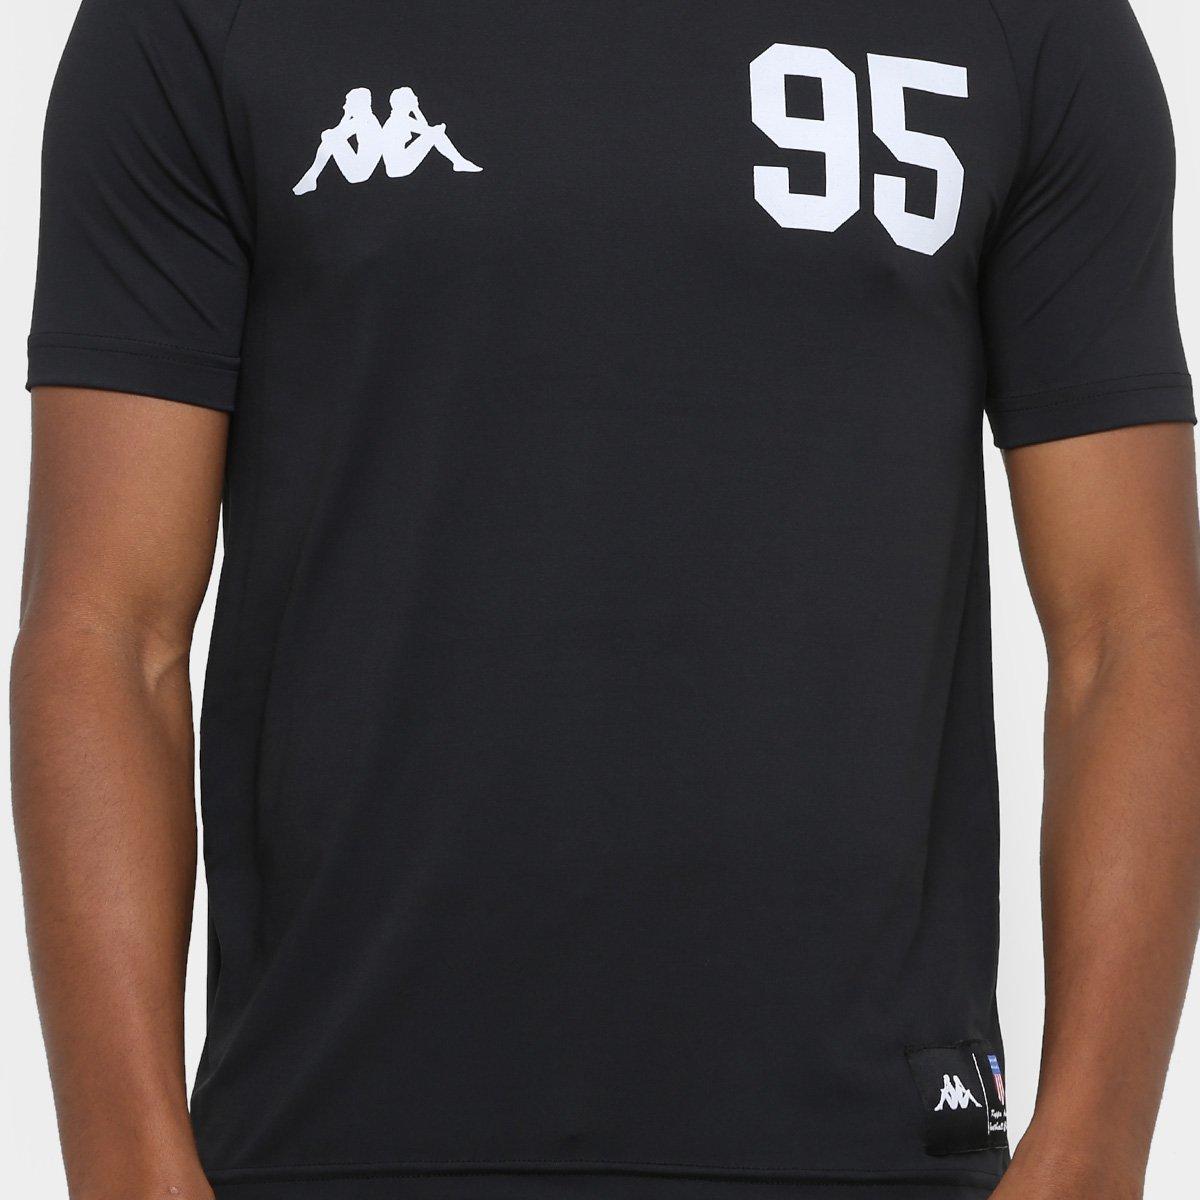 Camiseta Kappa Futebol Americano Oakland Kombat Masculina - Compre ... b19cbf884c8